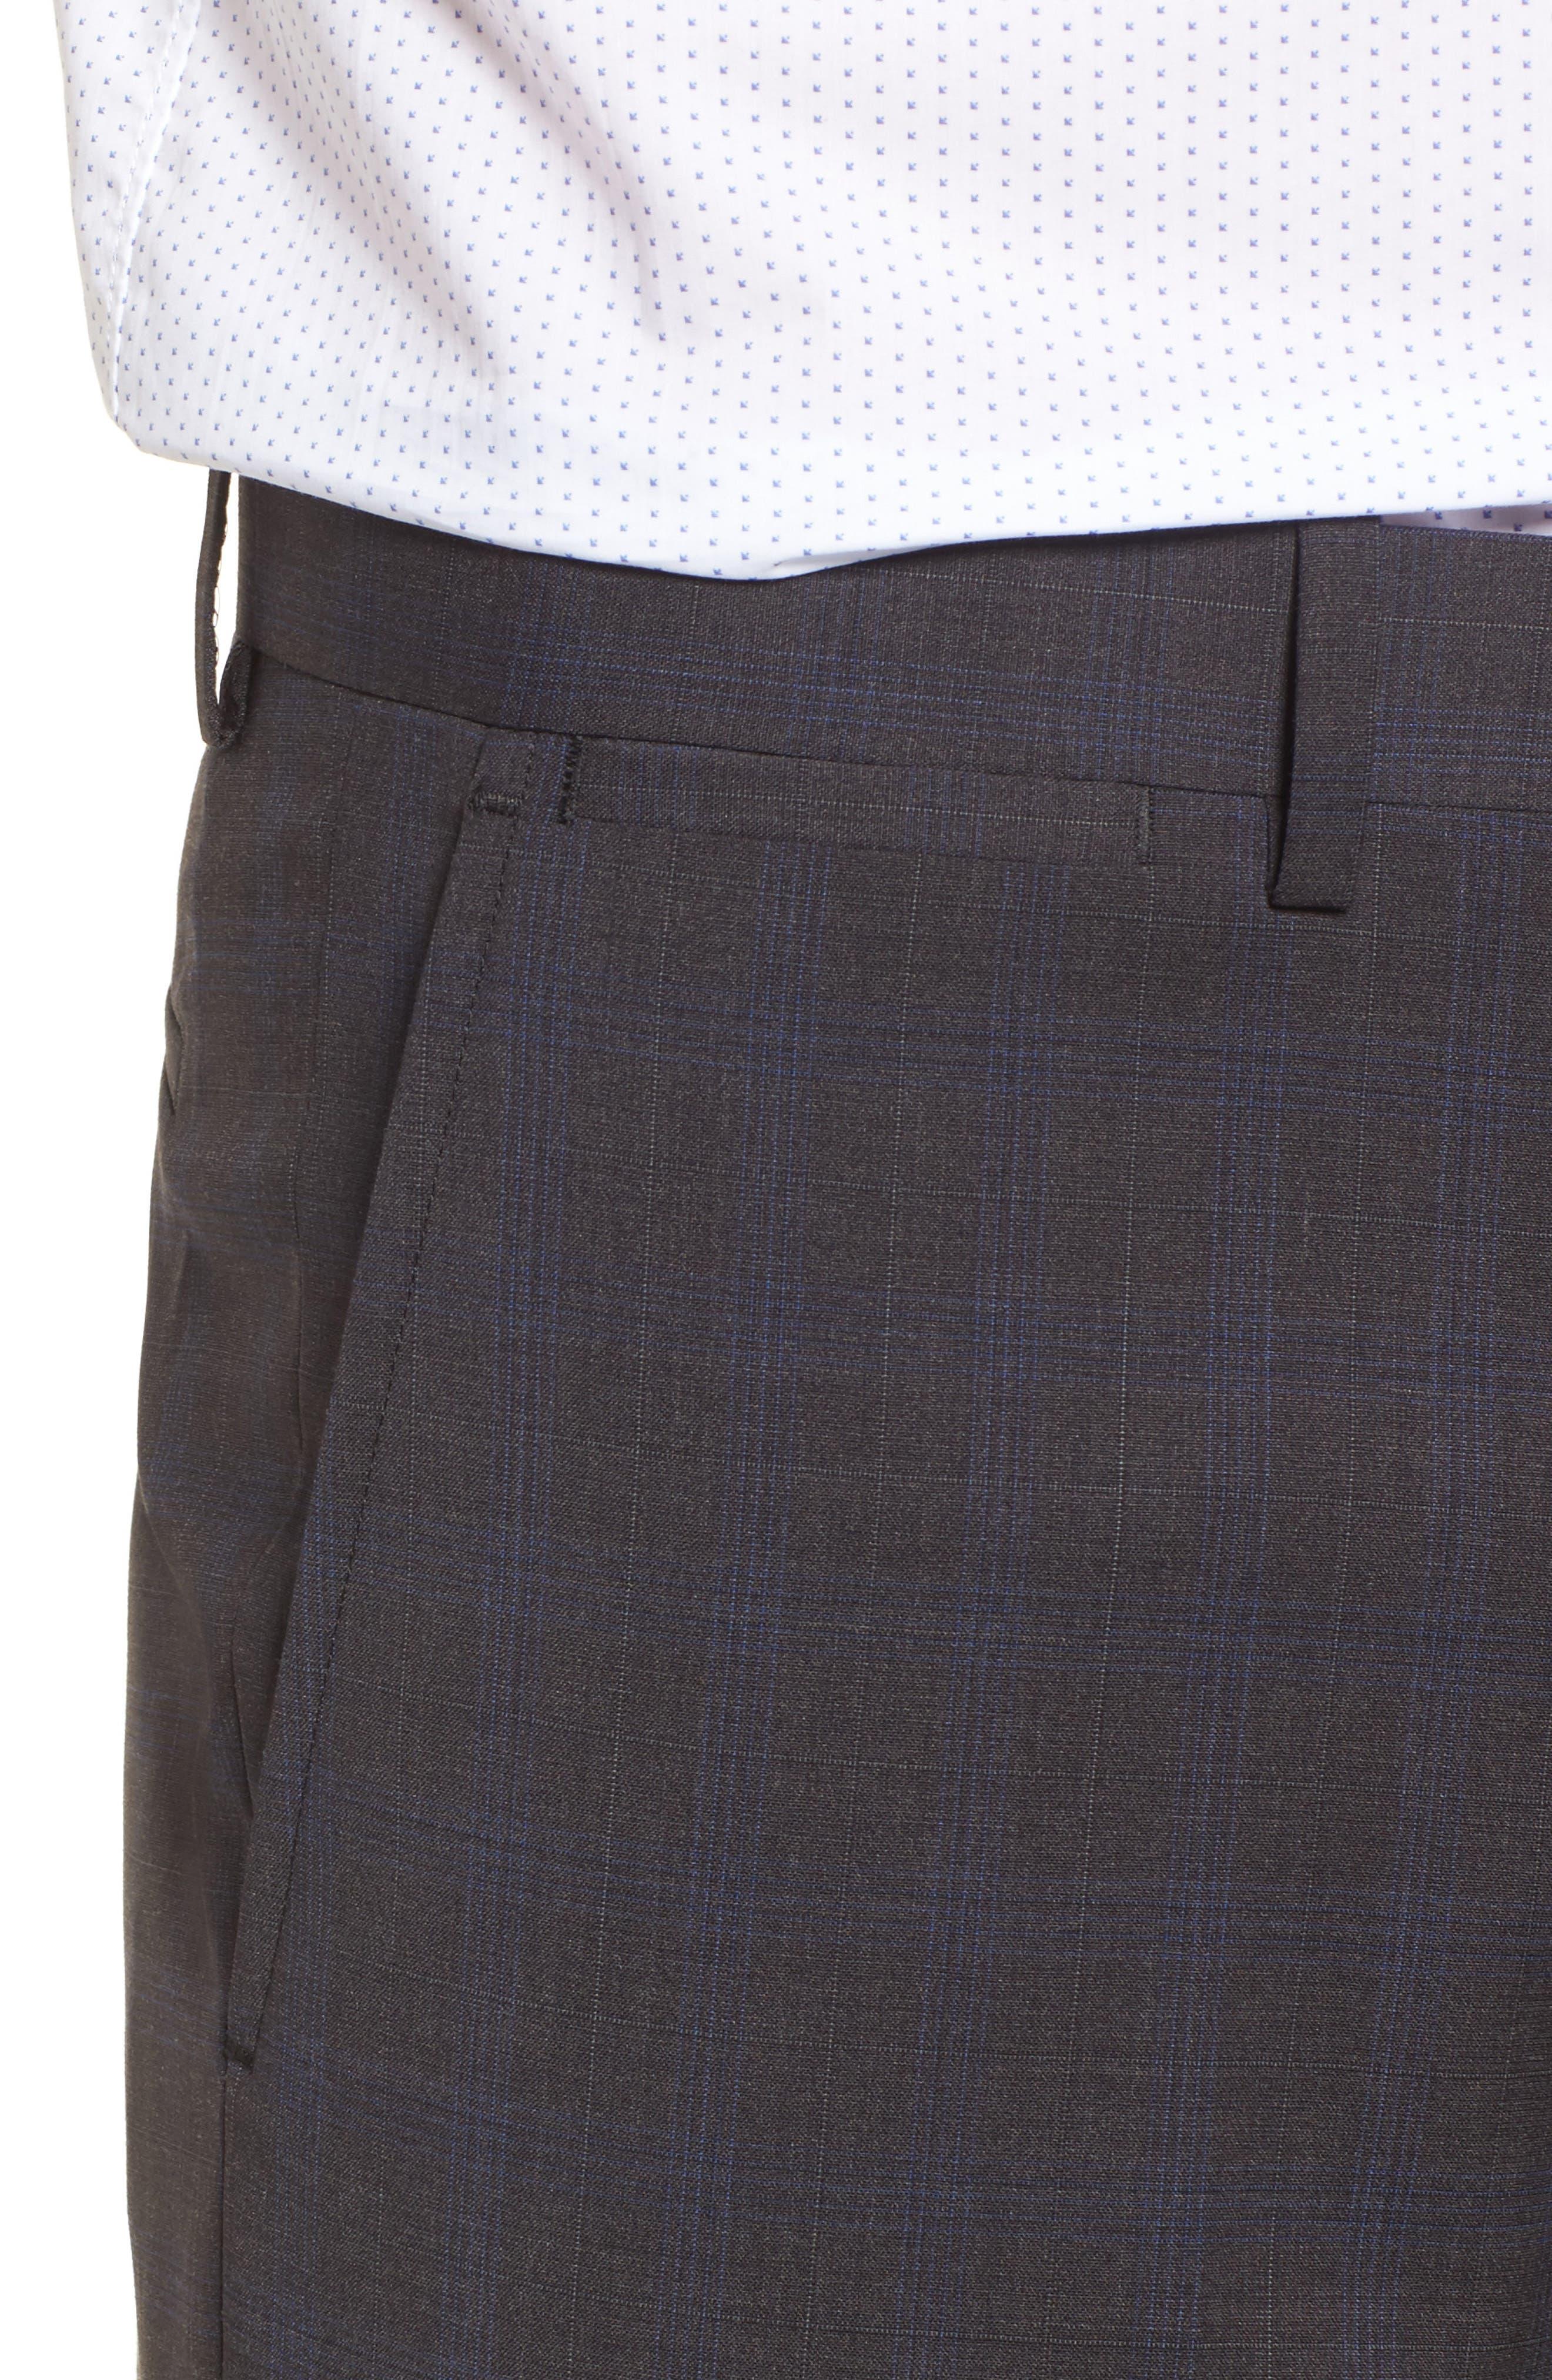 Marlo Trim Fit Tonal Plaid Trousers,                             Alternate thumbnail 4, color,                             053